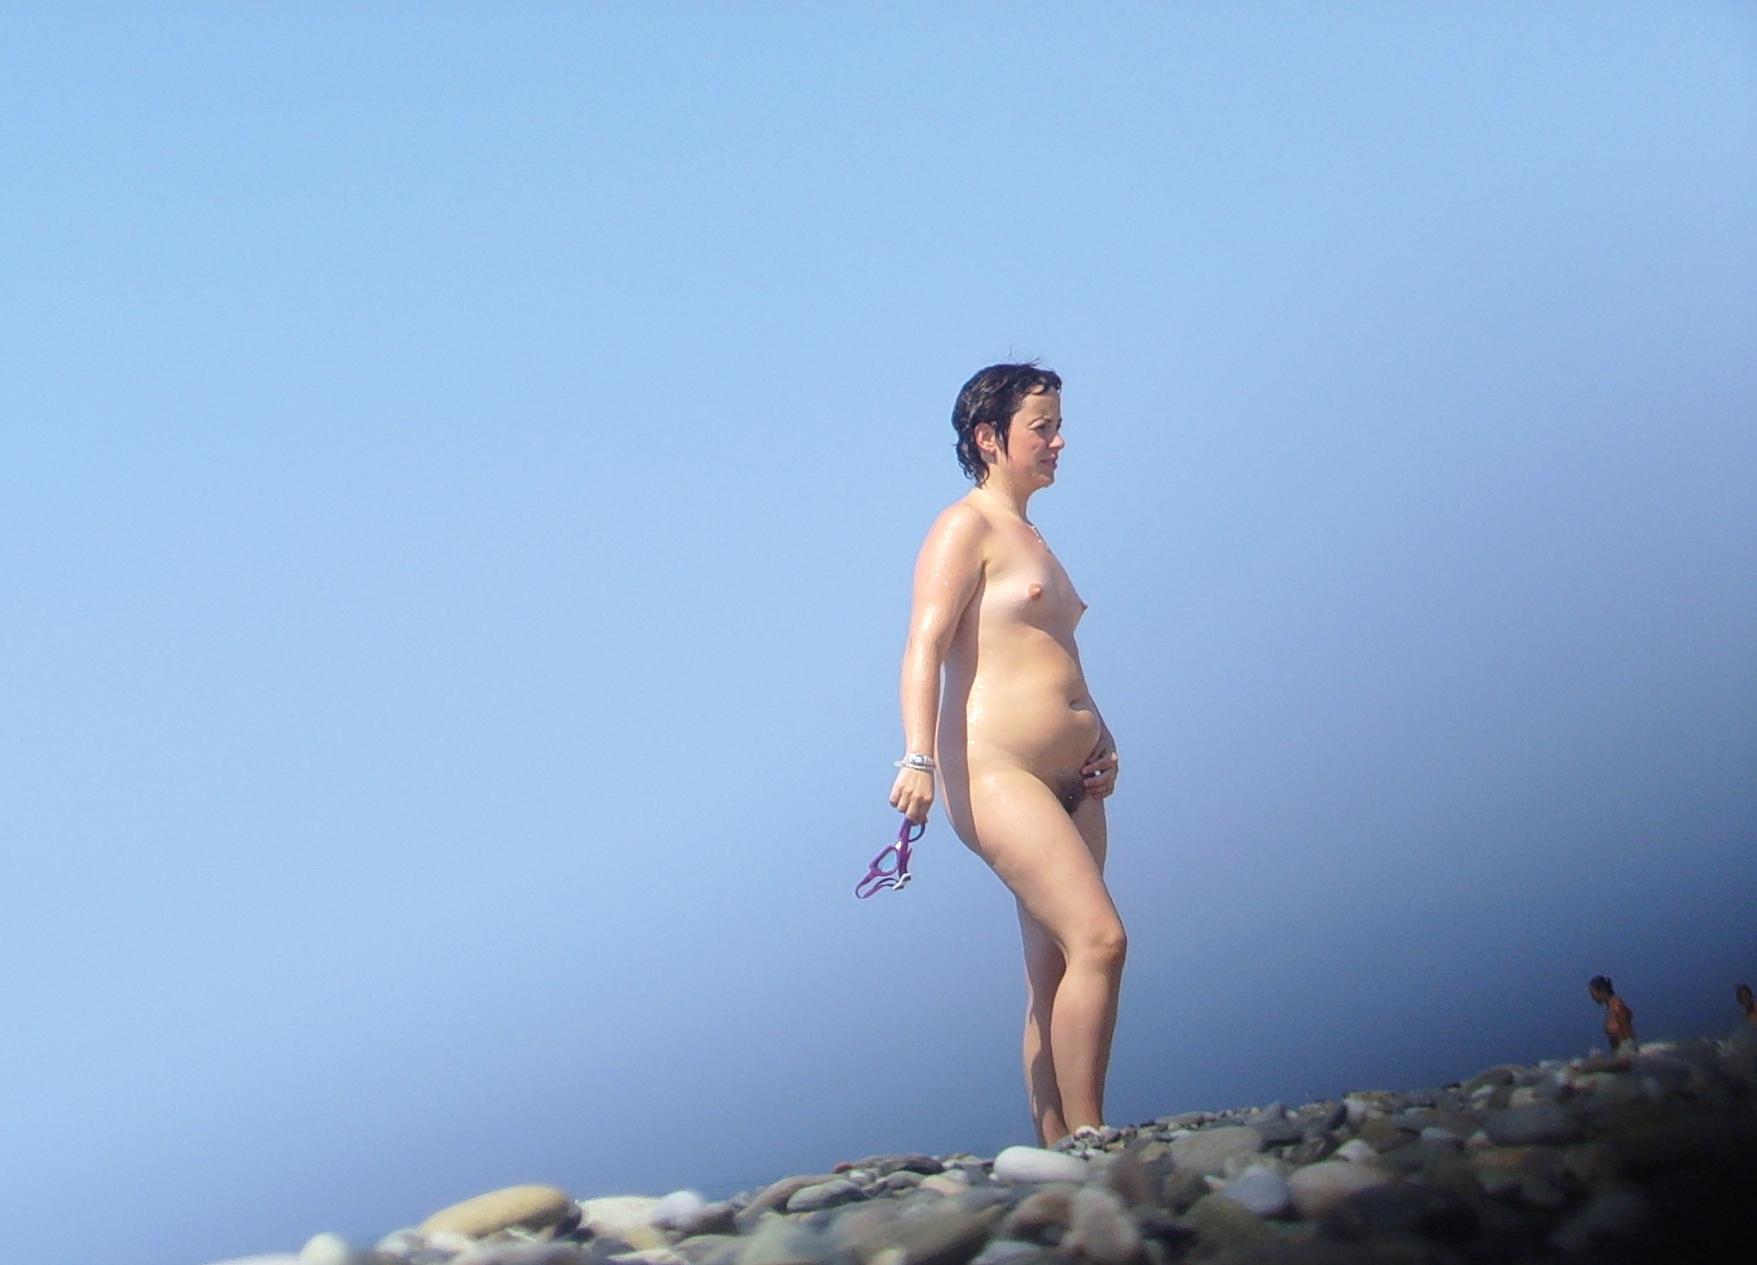 Teen girls nude at beach